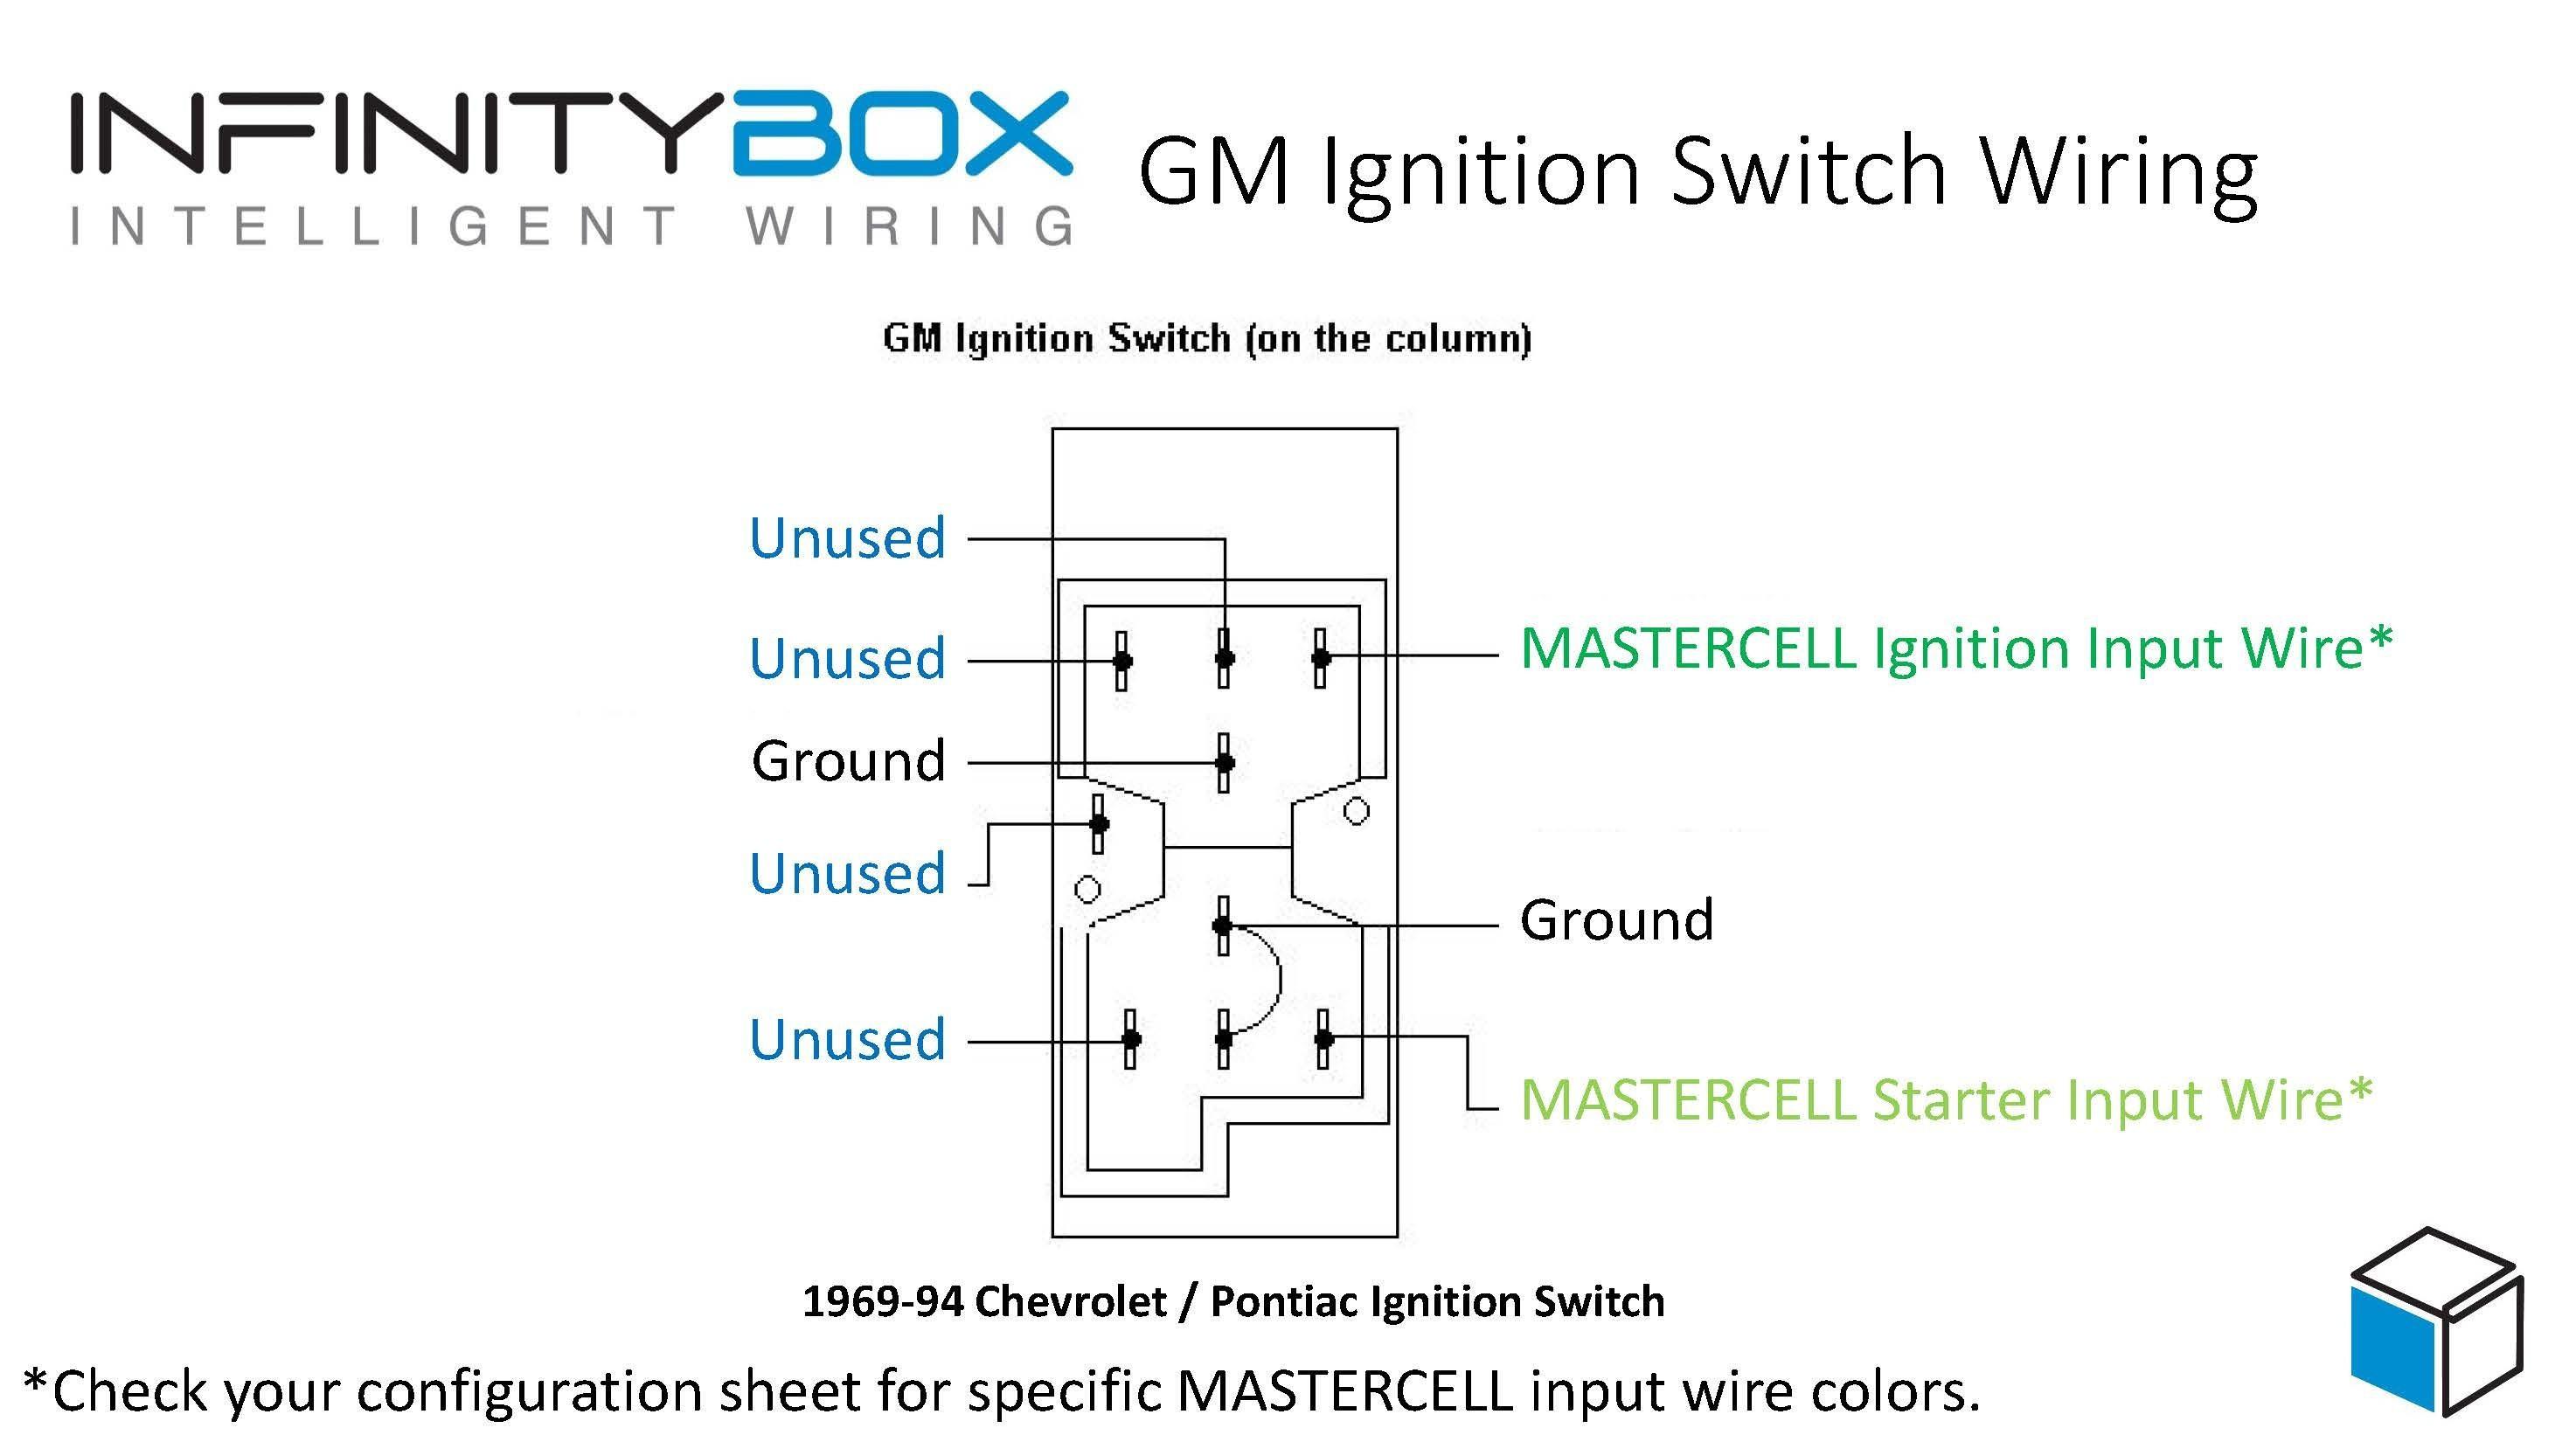 Gm Column Ignition Switch Wiring Diagram Valid Wiring Diagram For - Universal Ignition Switch Wiring Diagram